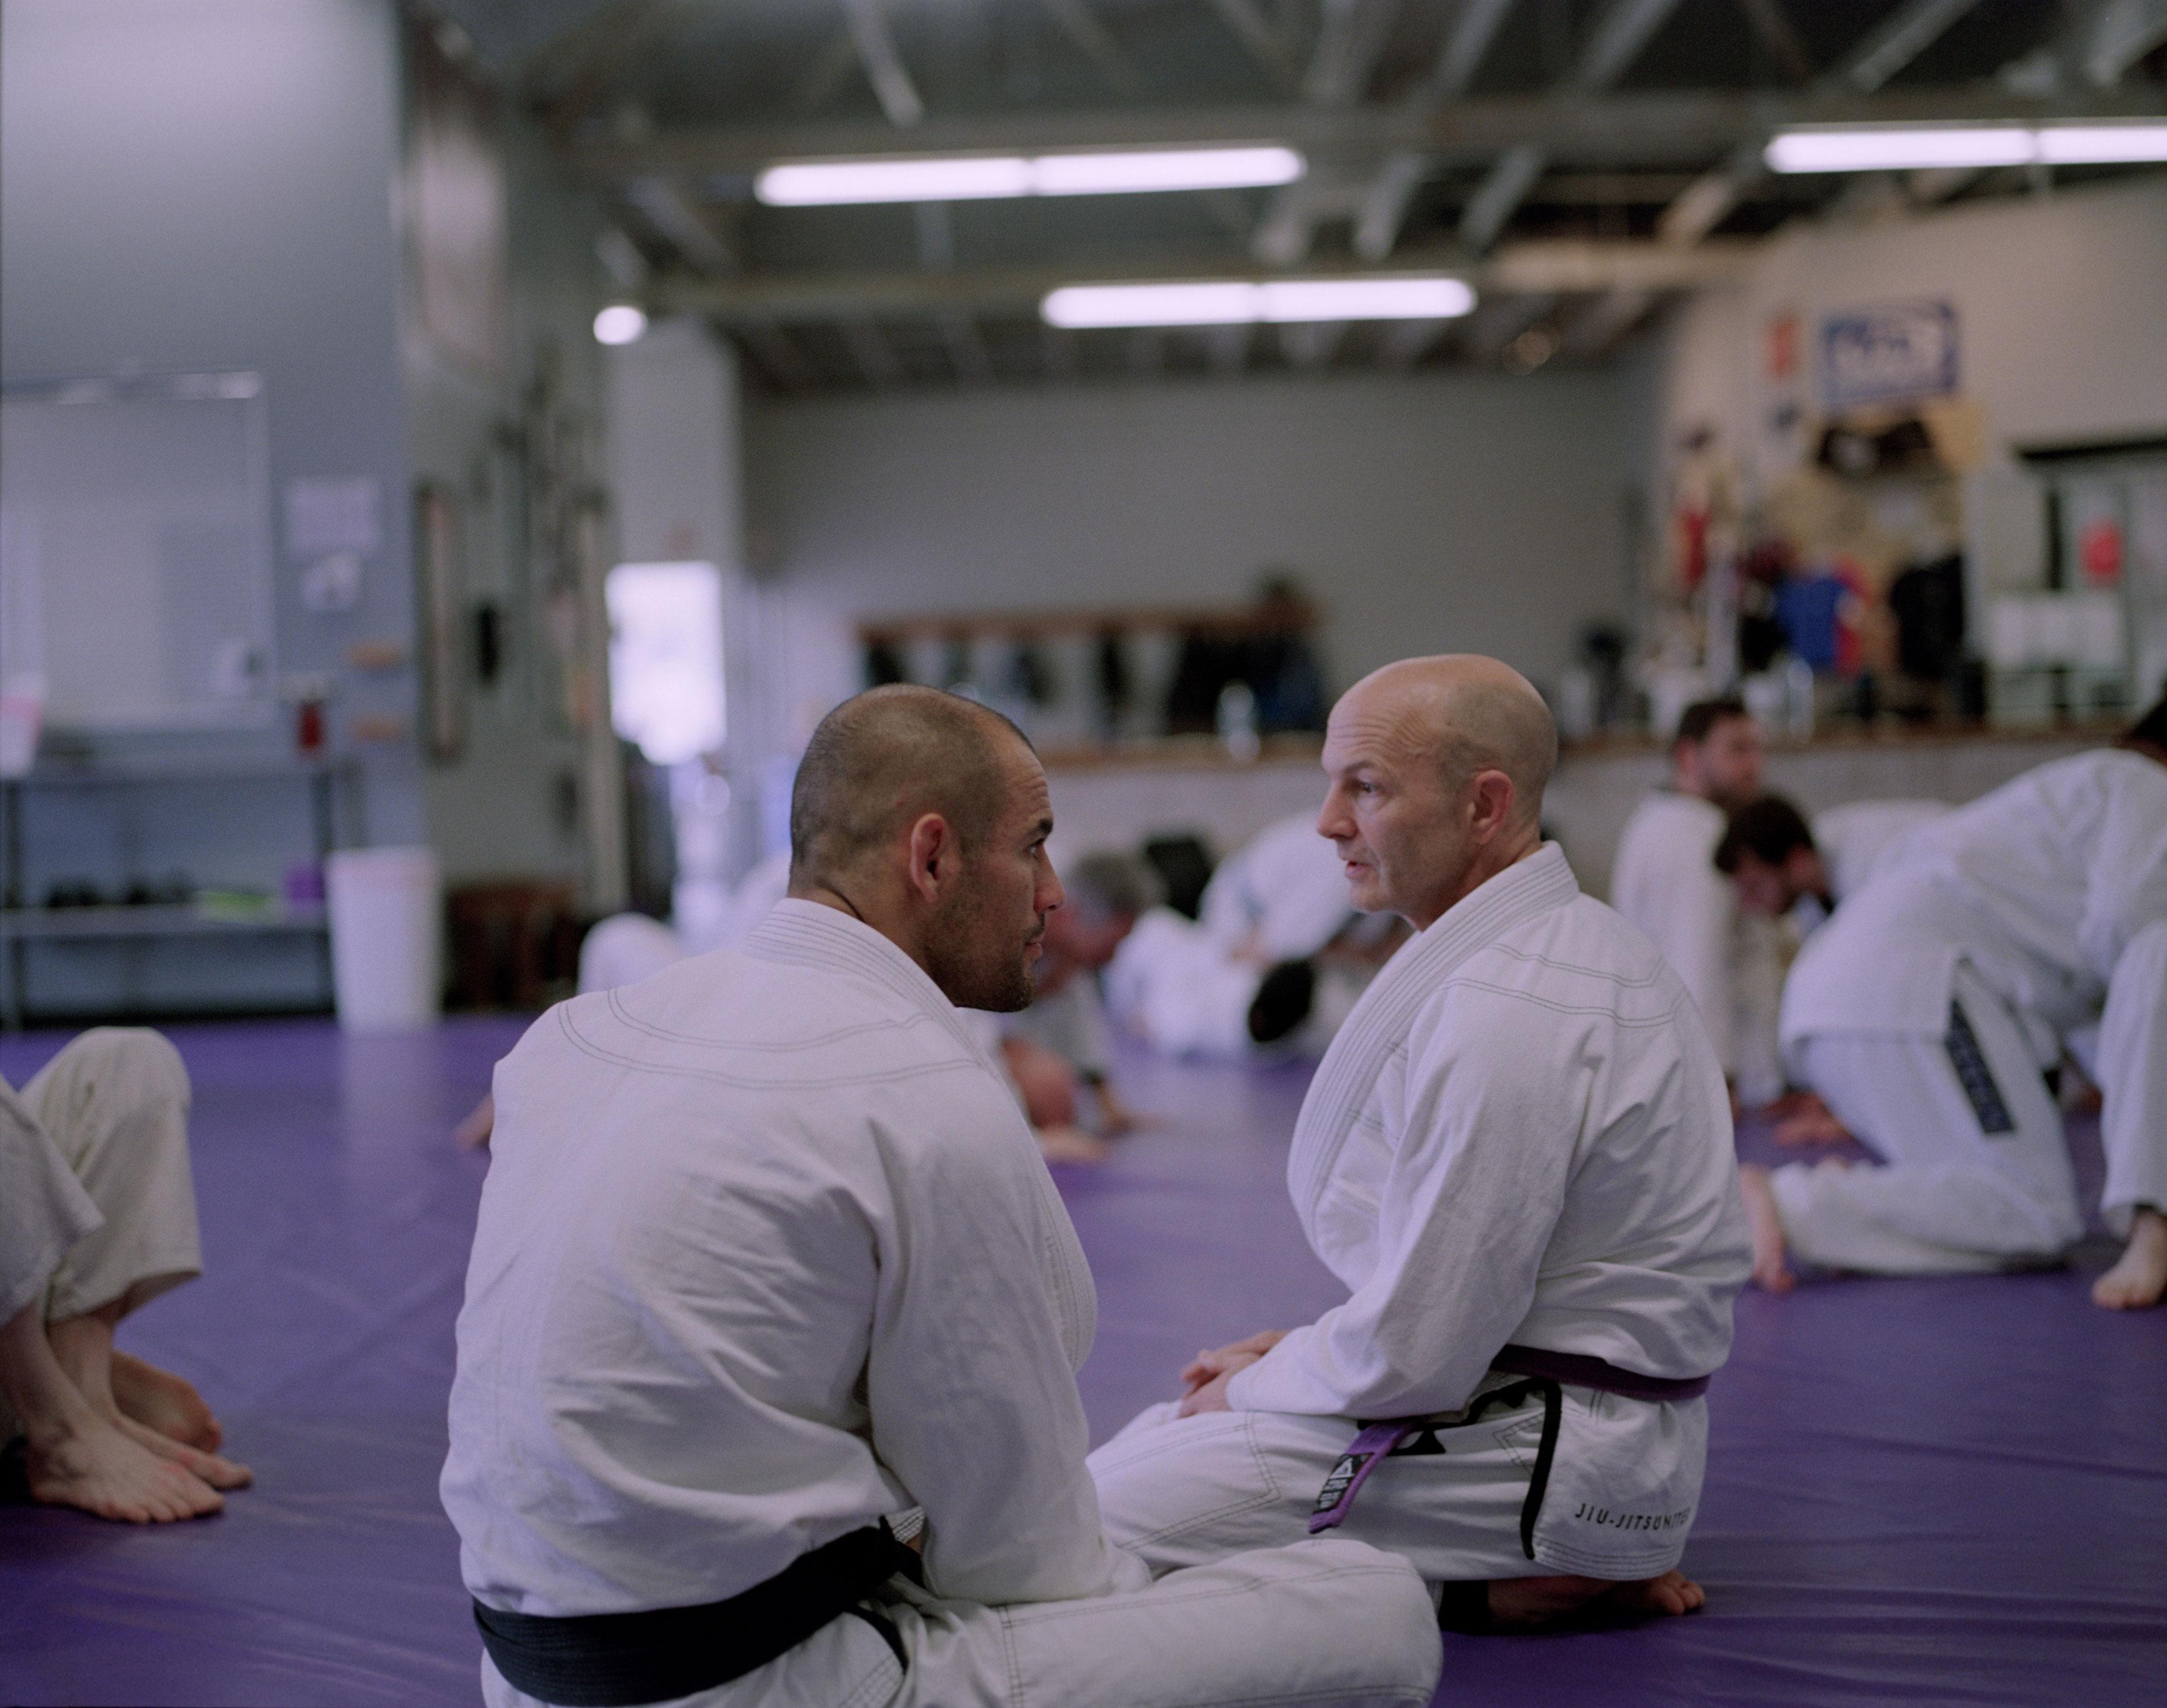 Gracie juijitsu instructor, John Ingallina, talking with Ryron Gracie